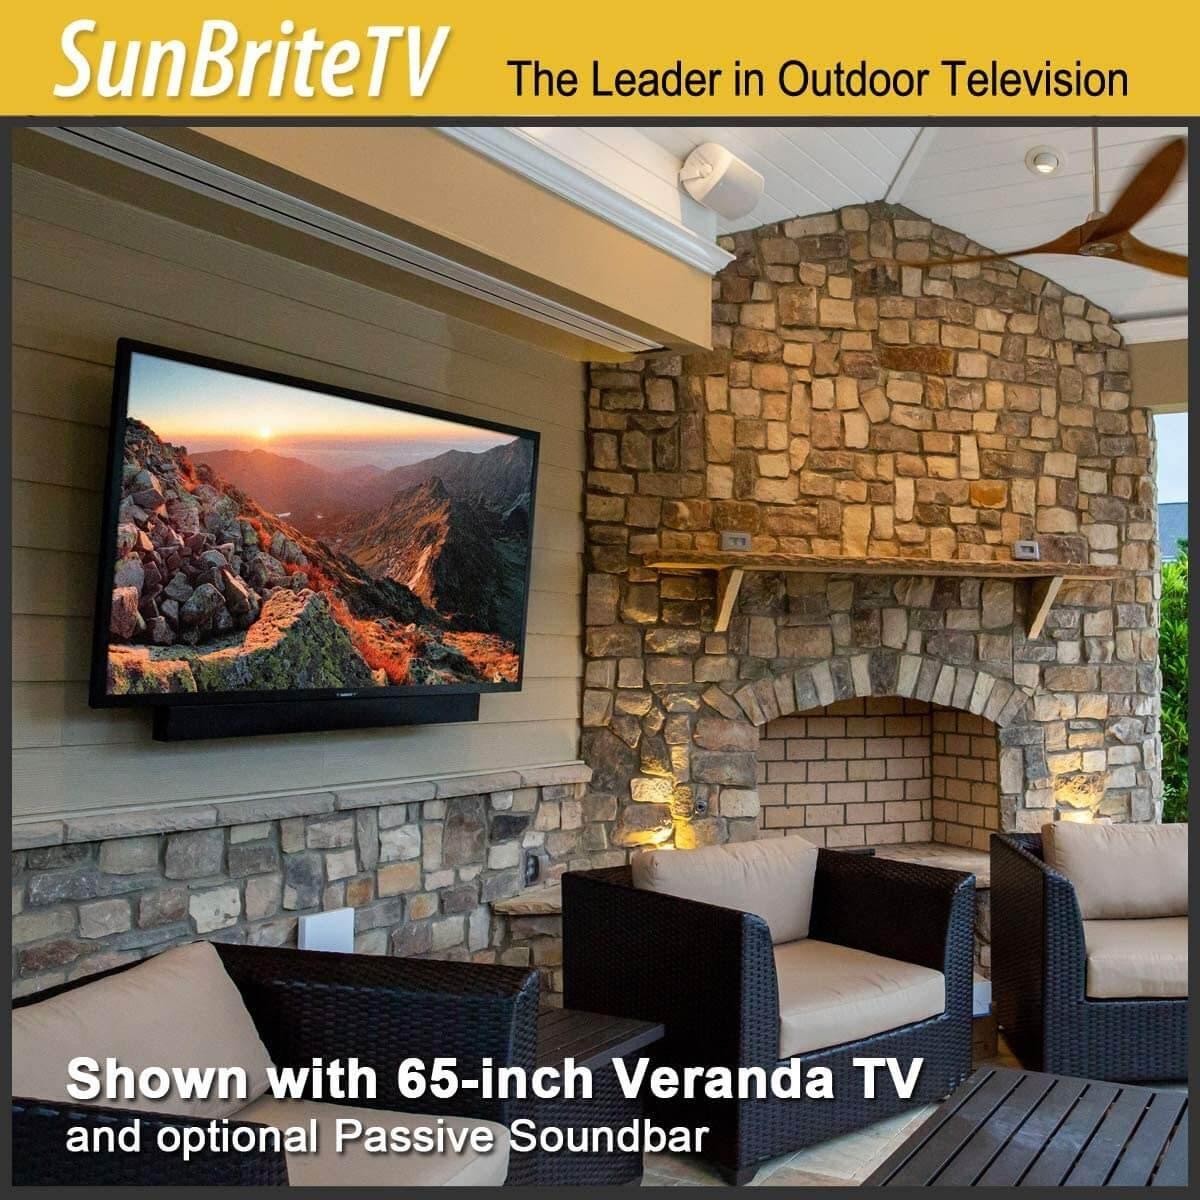 SunBriteTV Weatherproof Outdoor 55-Inch Veranda Series 4K UHD HDR LED Television - SB-V-55-4KHDR-BL